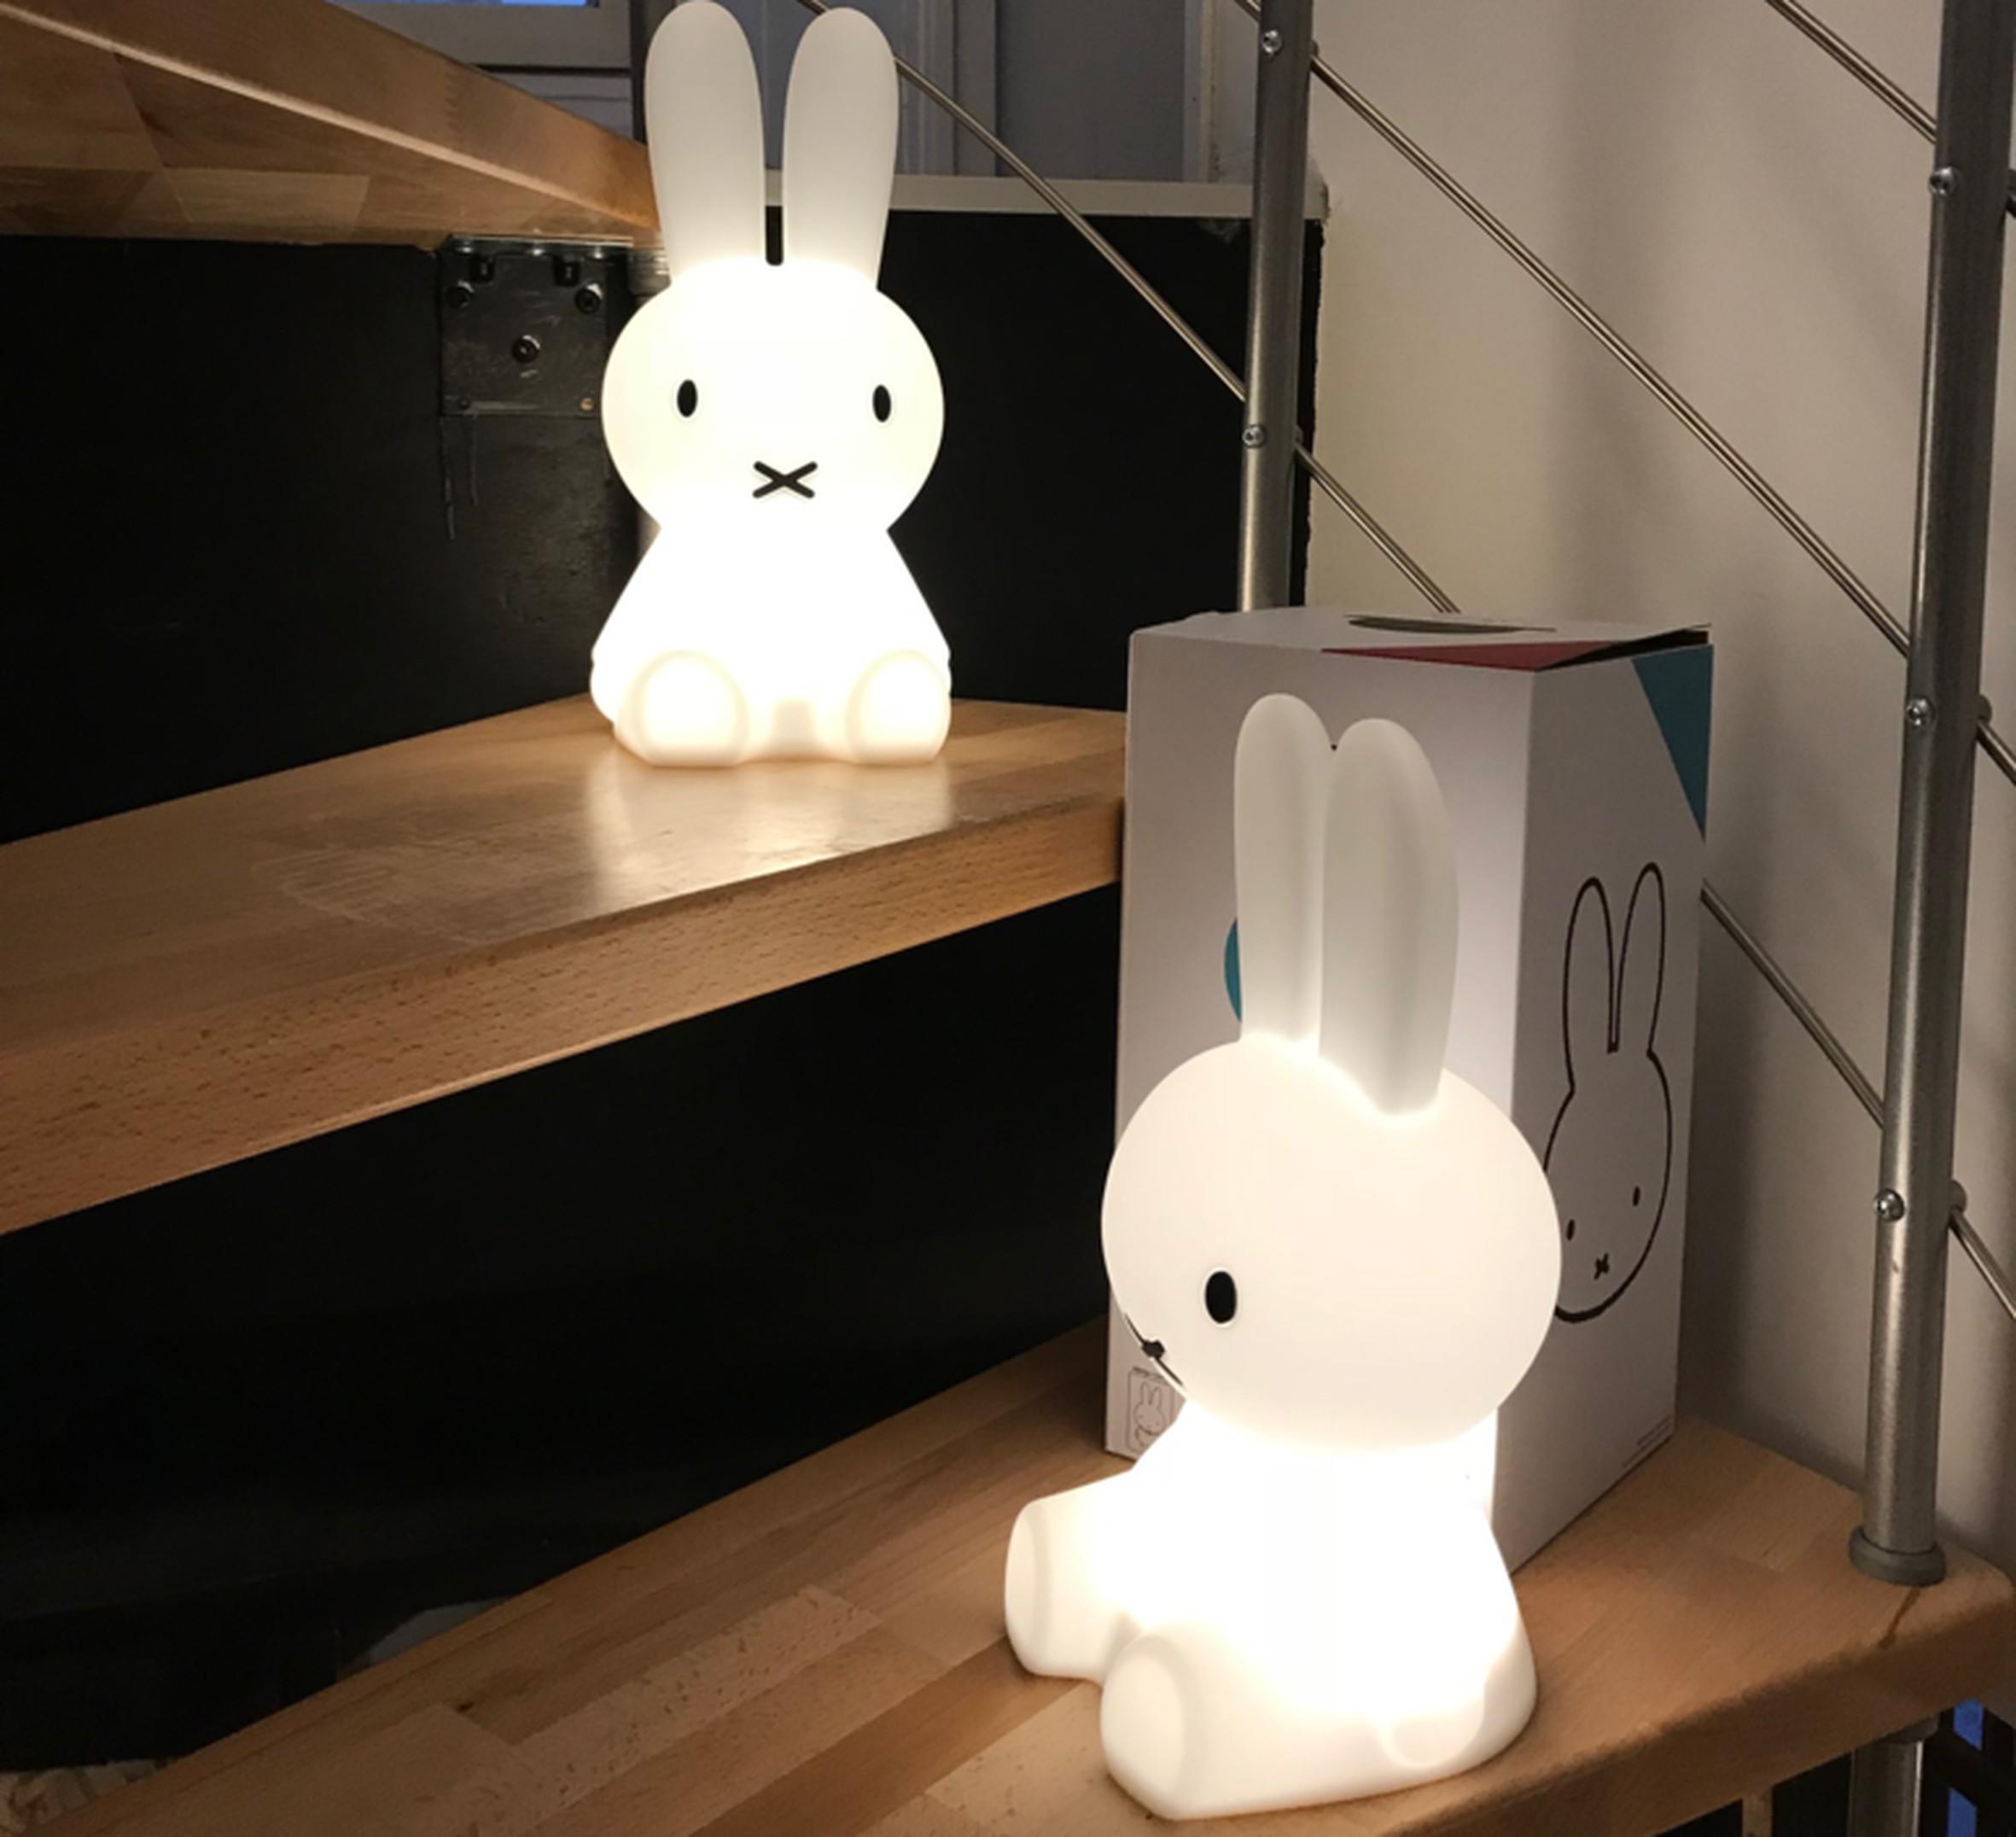 Lampe Veilleuse Lapin Miffy press loft | image of lampe, veilleuse, lapin, miffy - my